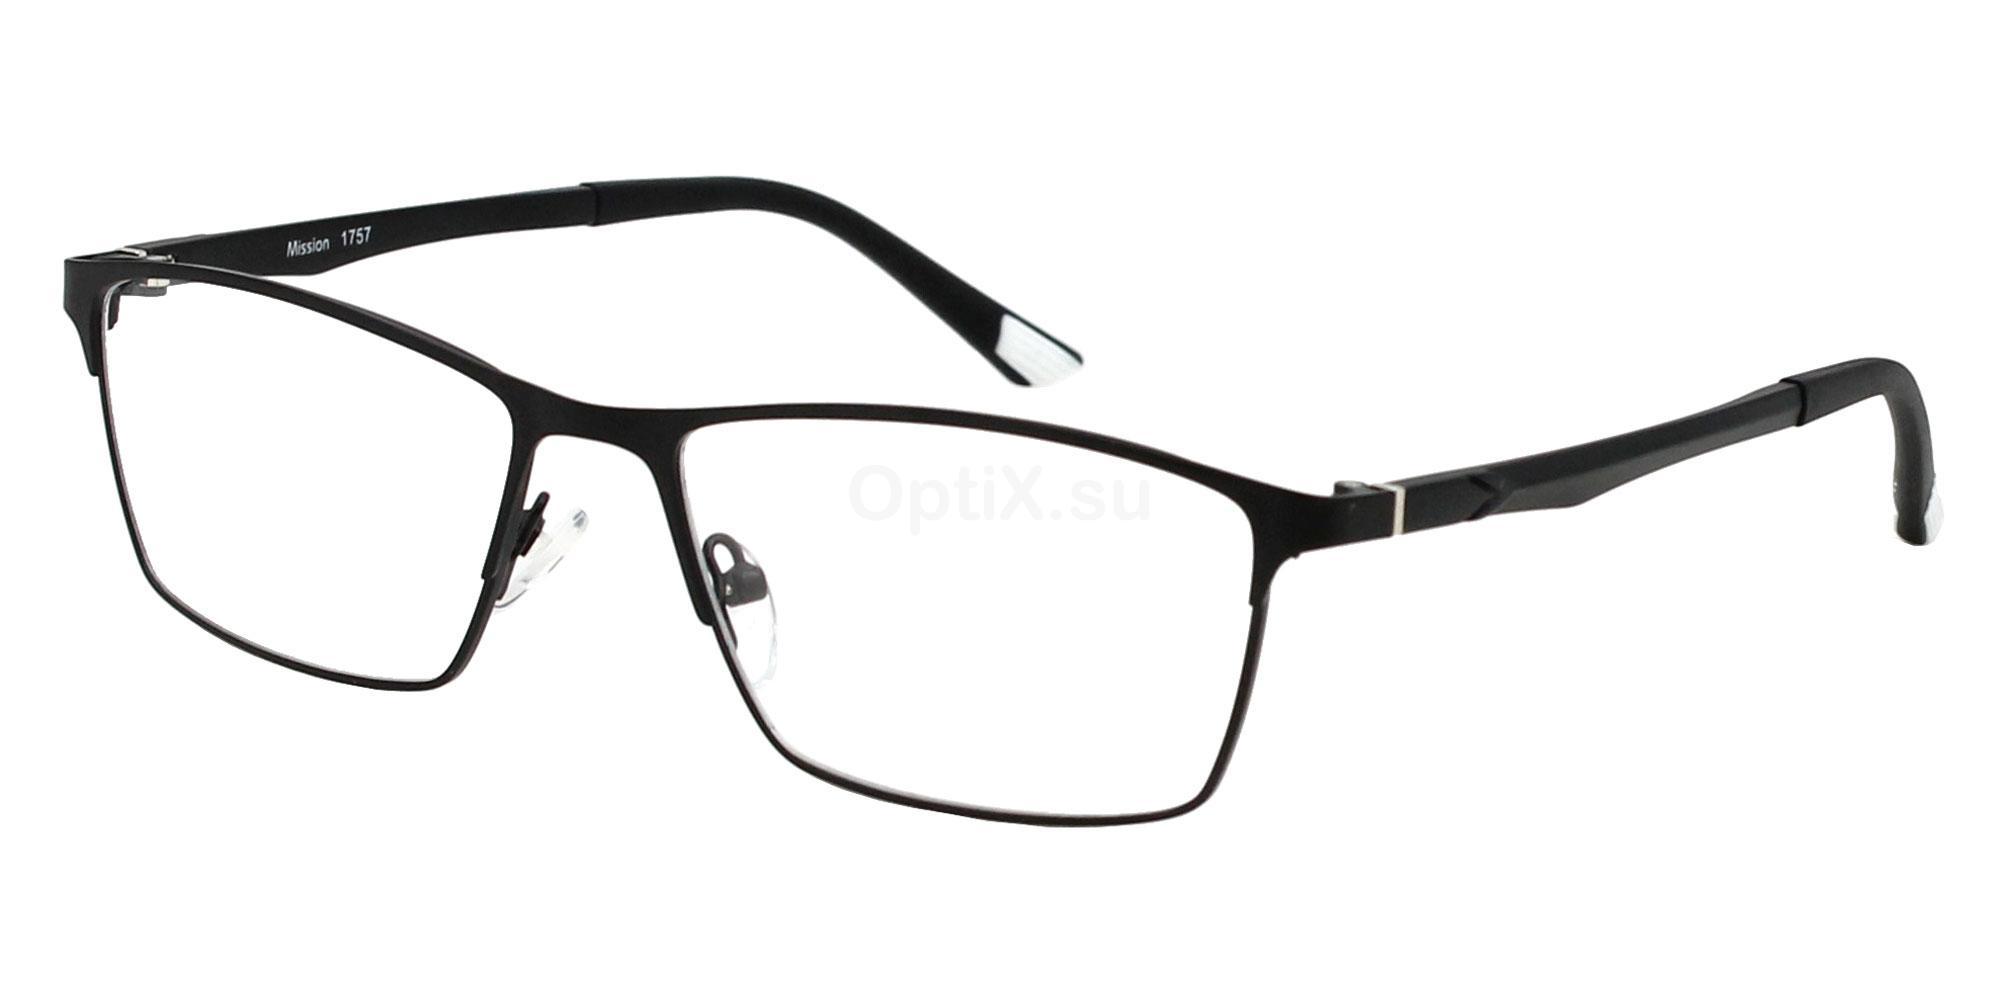 01 1757 Glasses, Mission